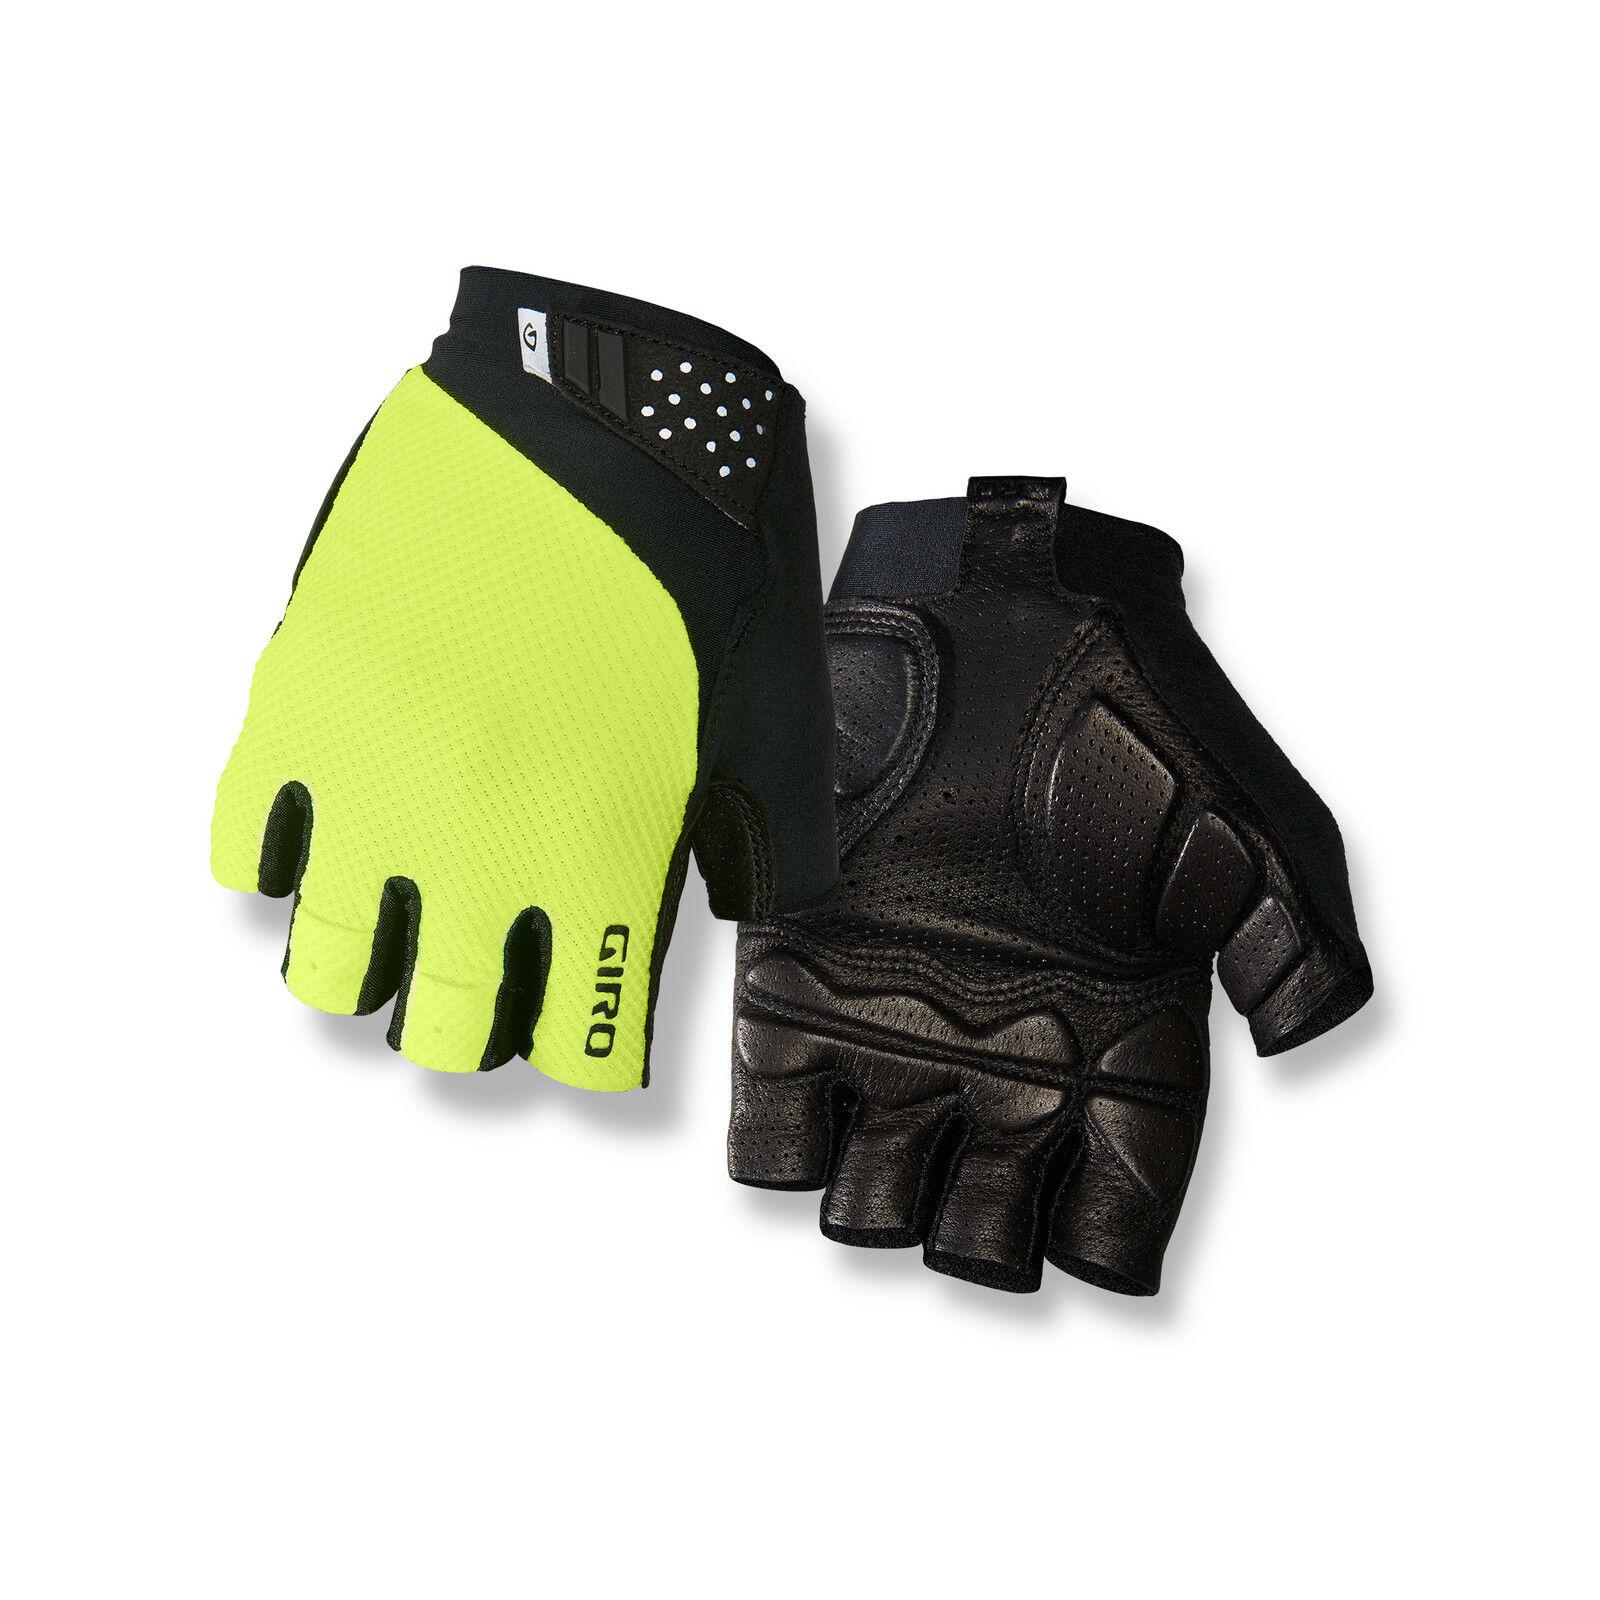 Giro Monaco II Gel Fahrrad Handschuhe kurz gelb/schwarz 2019